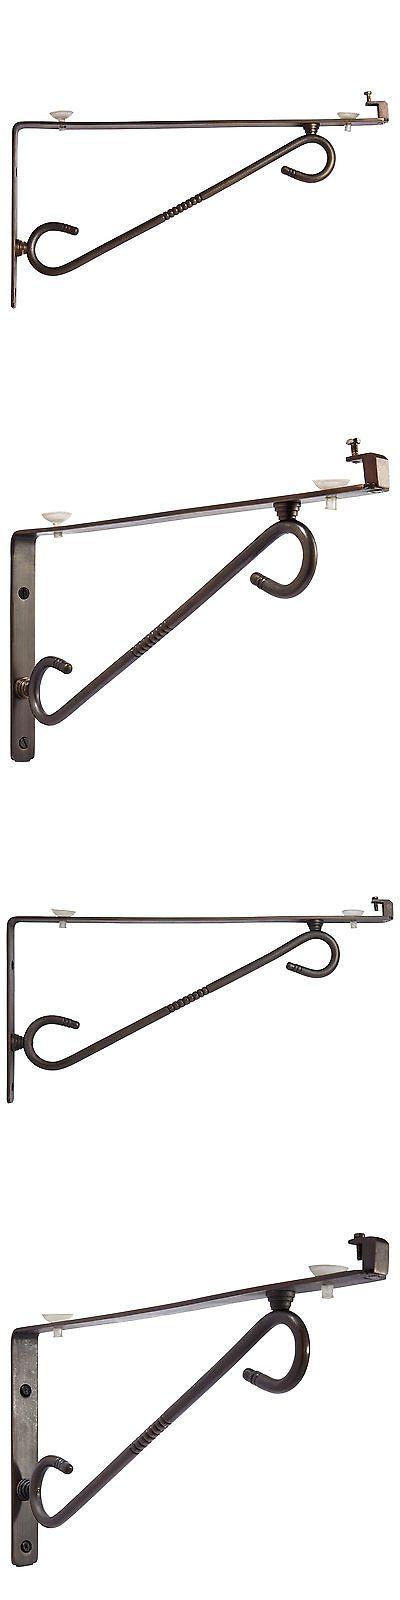 Braces and Brackets 45816: Signature Hardware Scrolling Arm Glass Shelf Bracket -> BUY IT NOW ONLY: $33.95 on eBay!